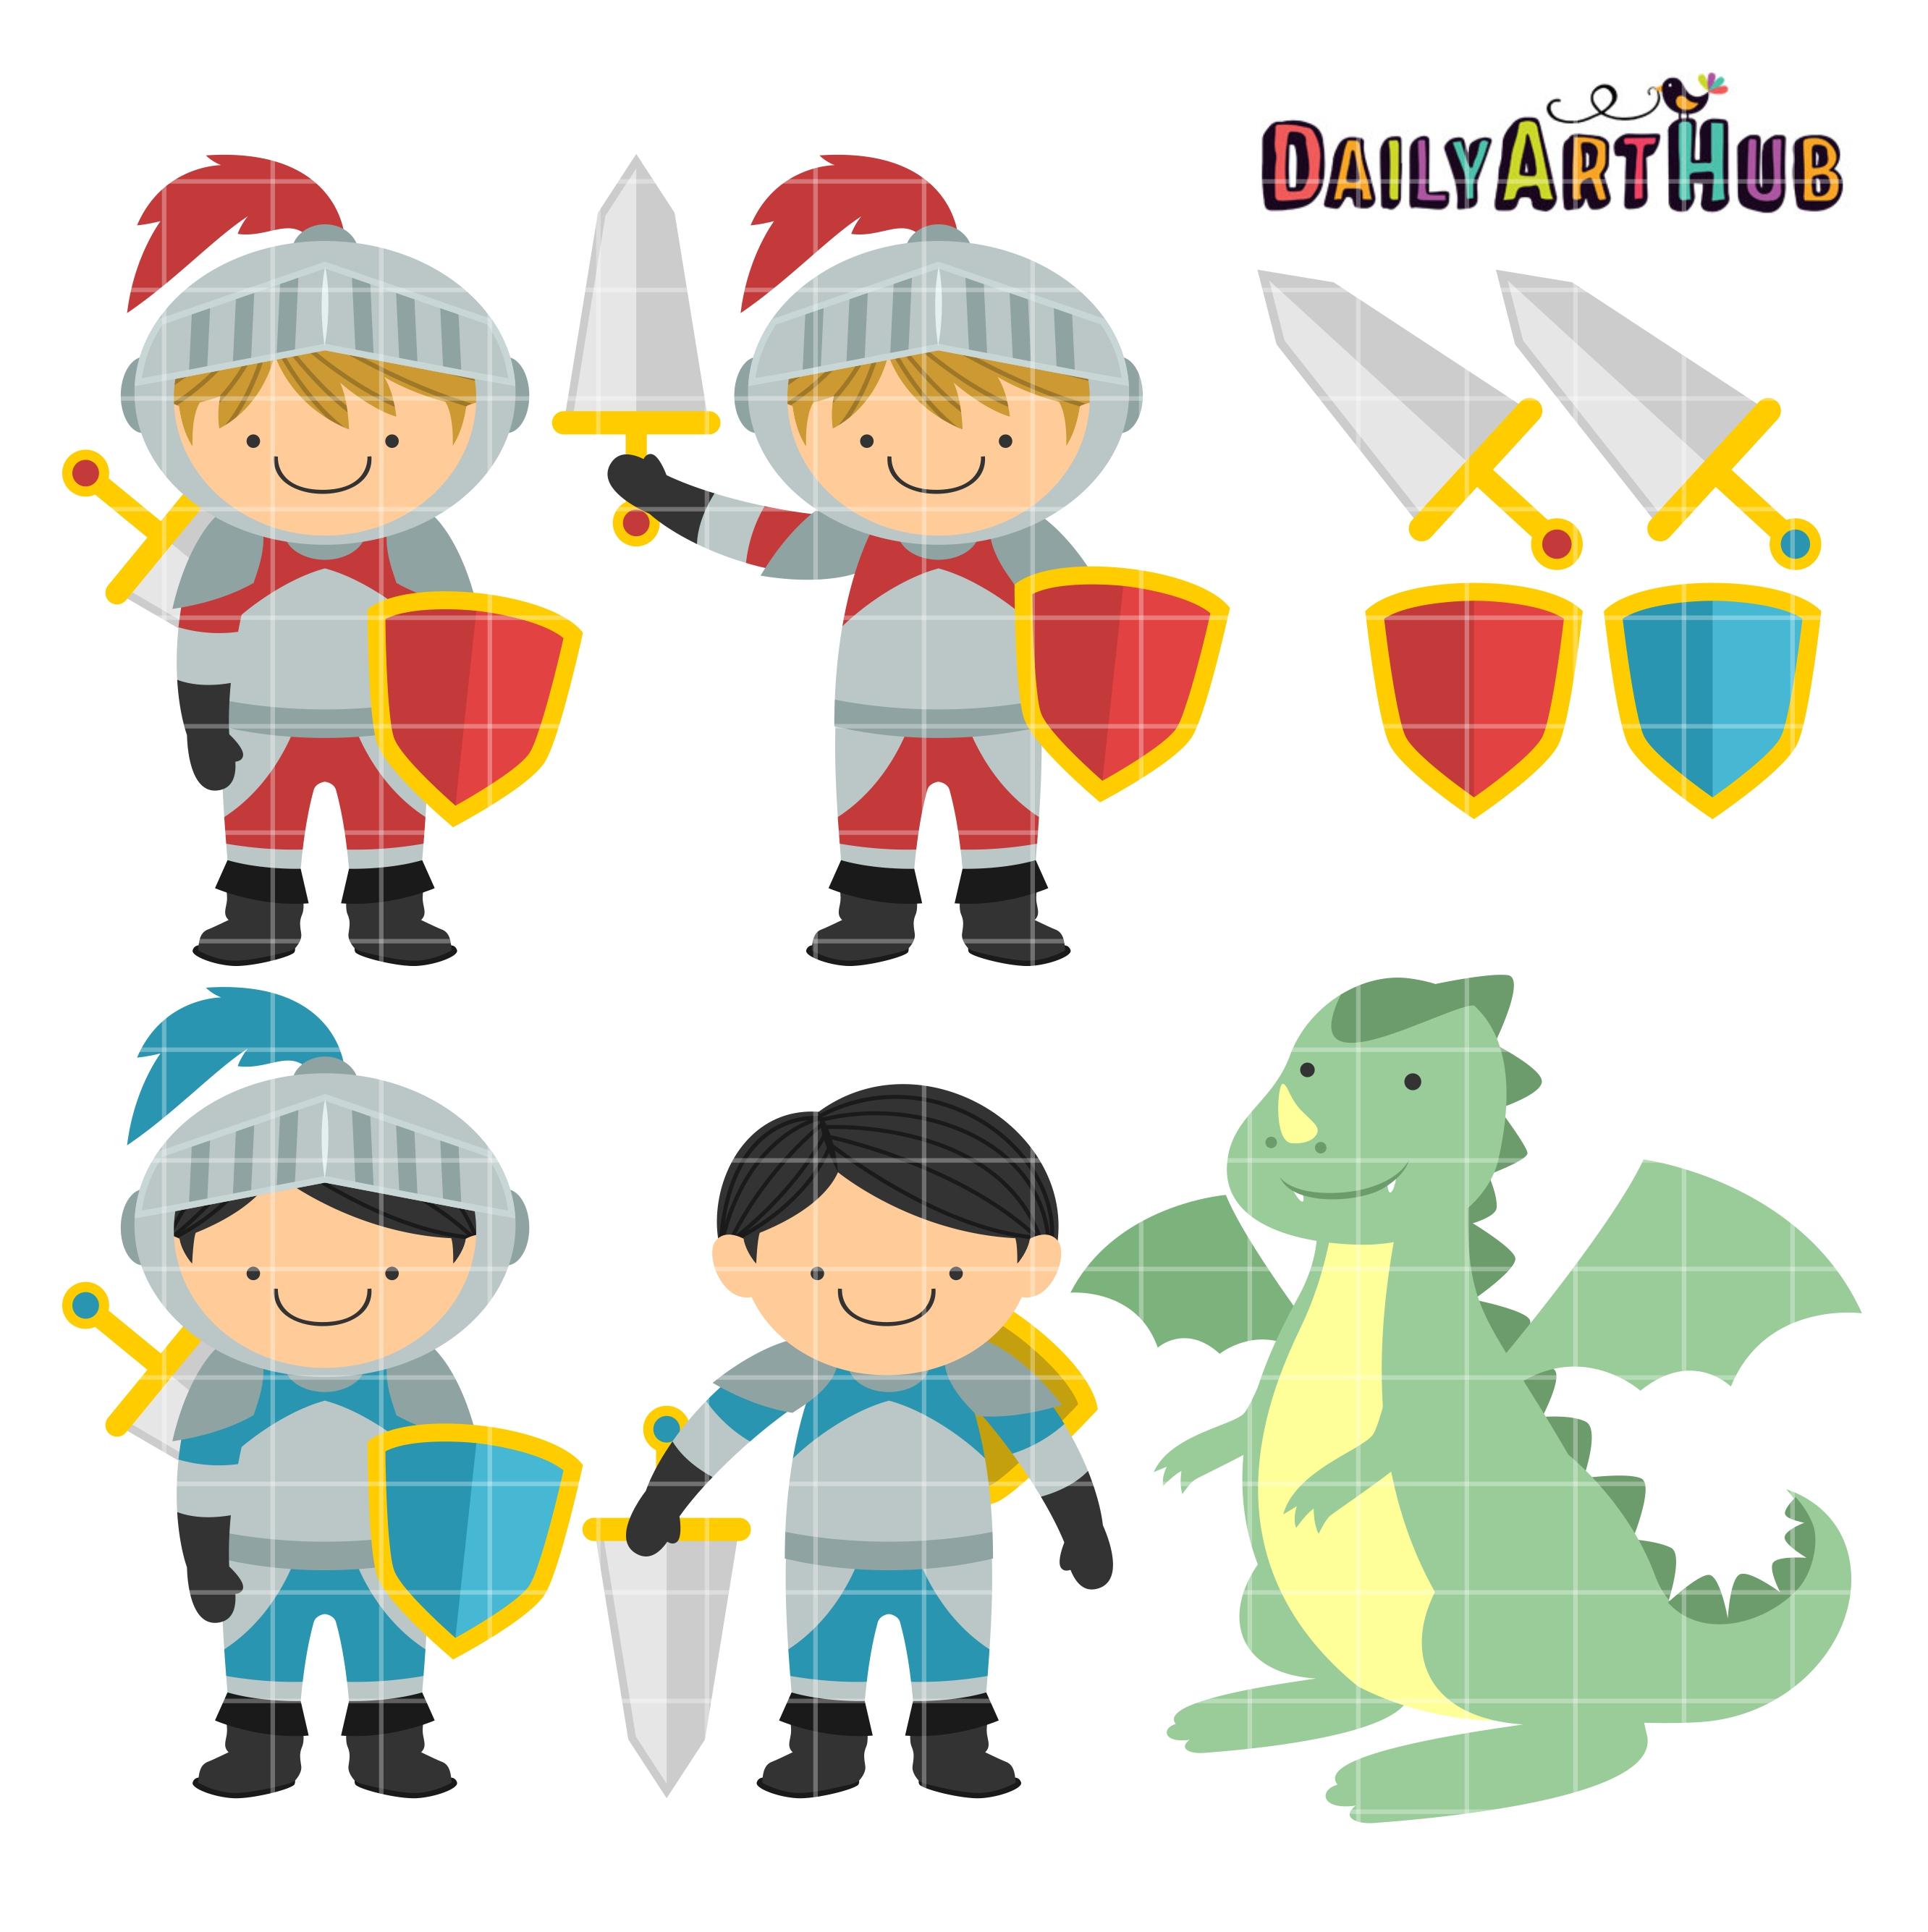 2664x2670 Cute Knights And Dragon Clip Art Set Daily Art Hub Free Clip